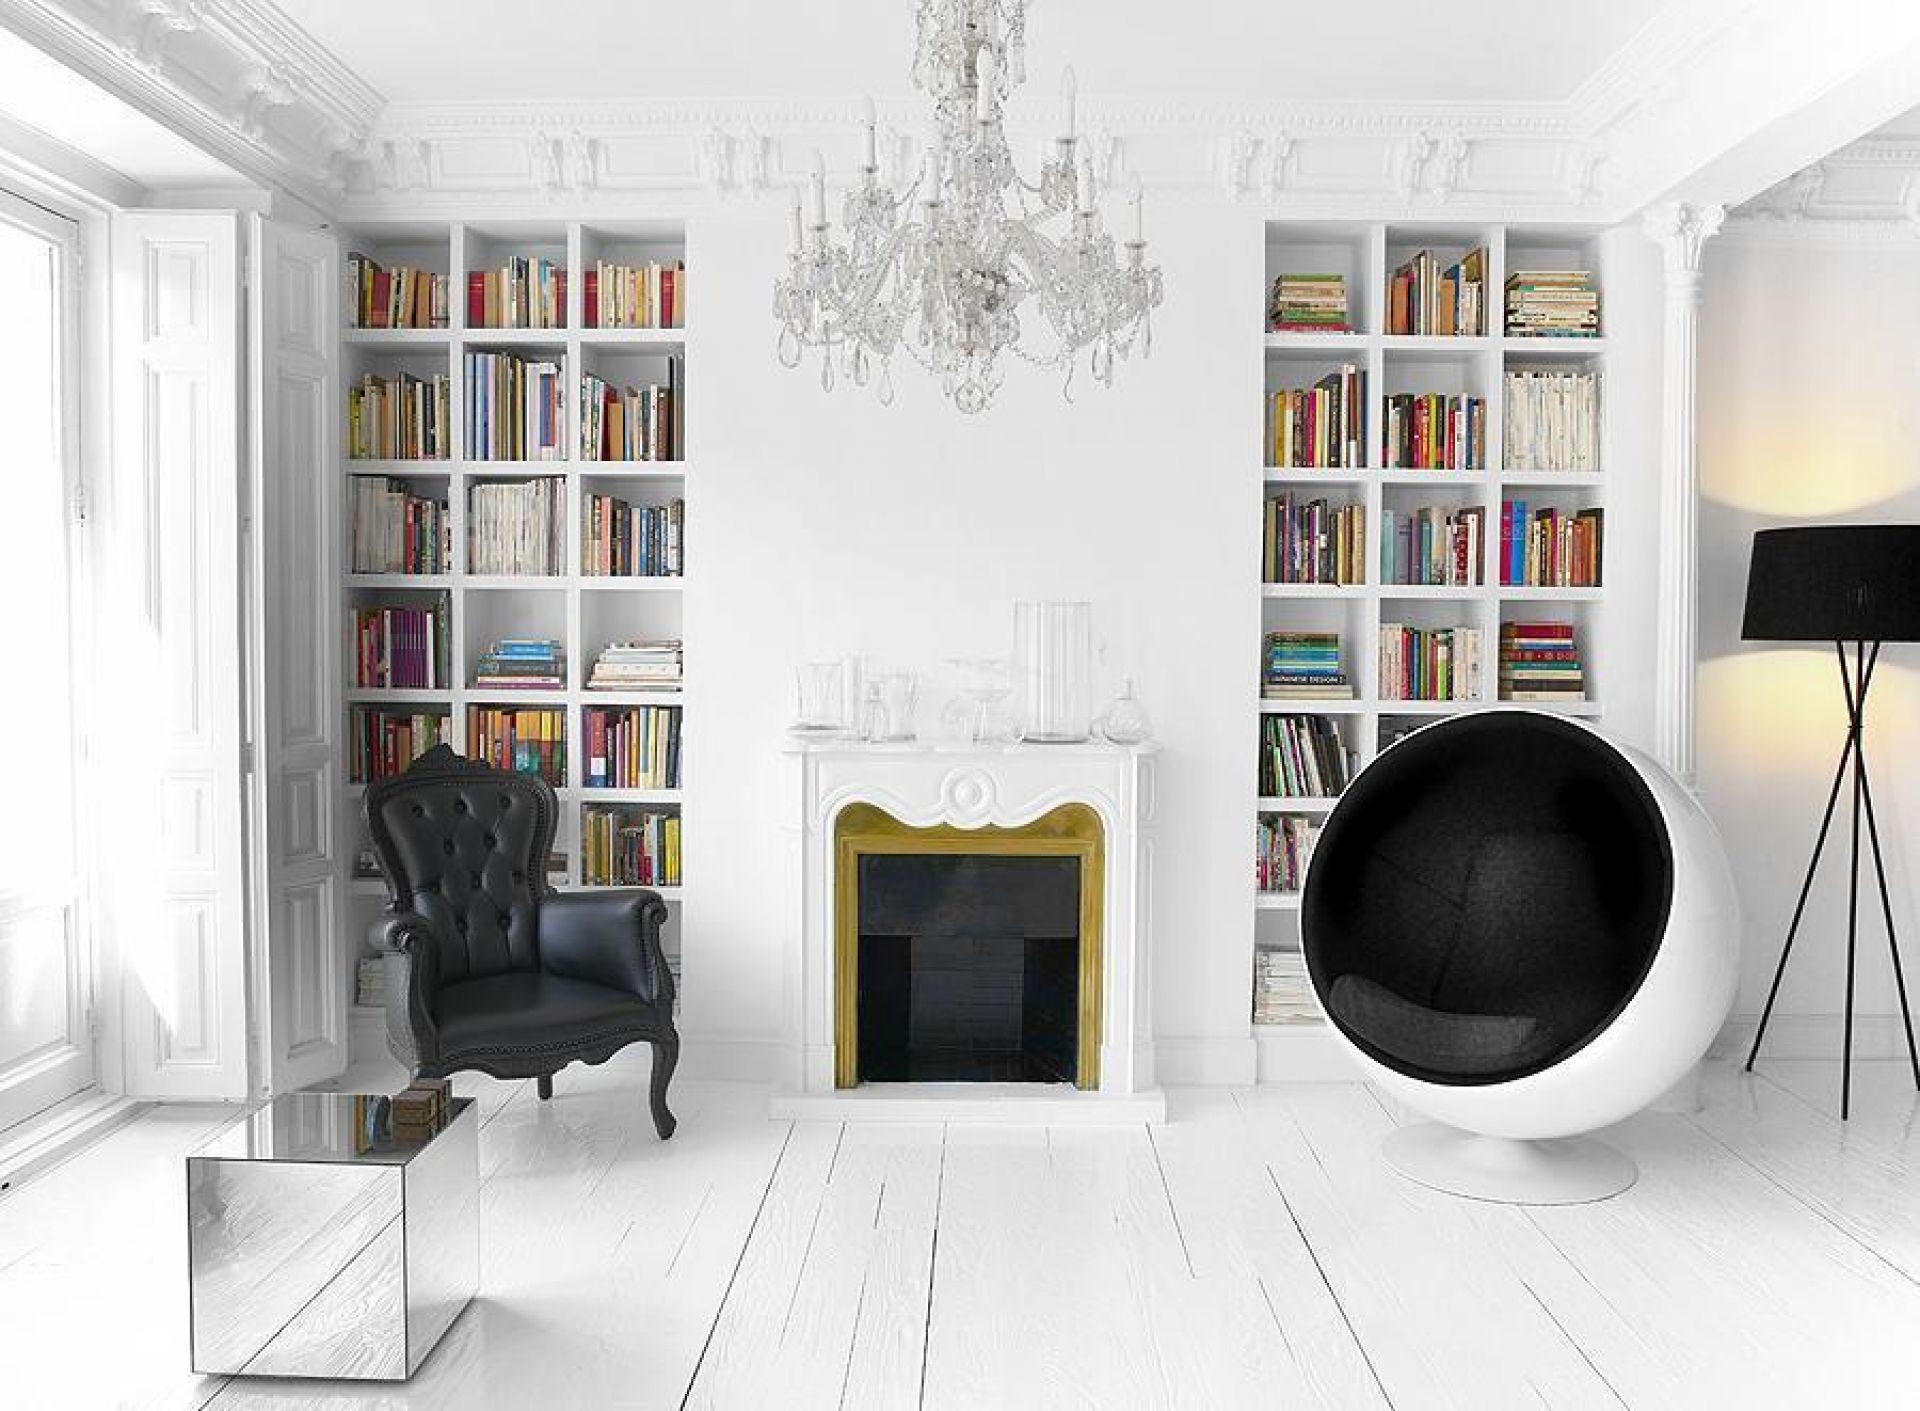 Ball Chair grey 216 Eero Aarnio Originals